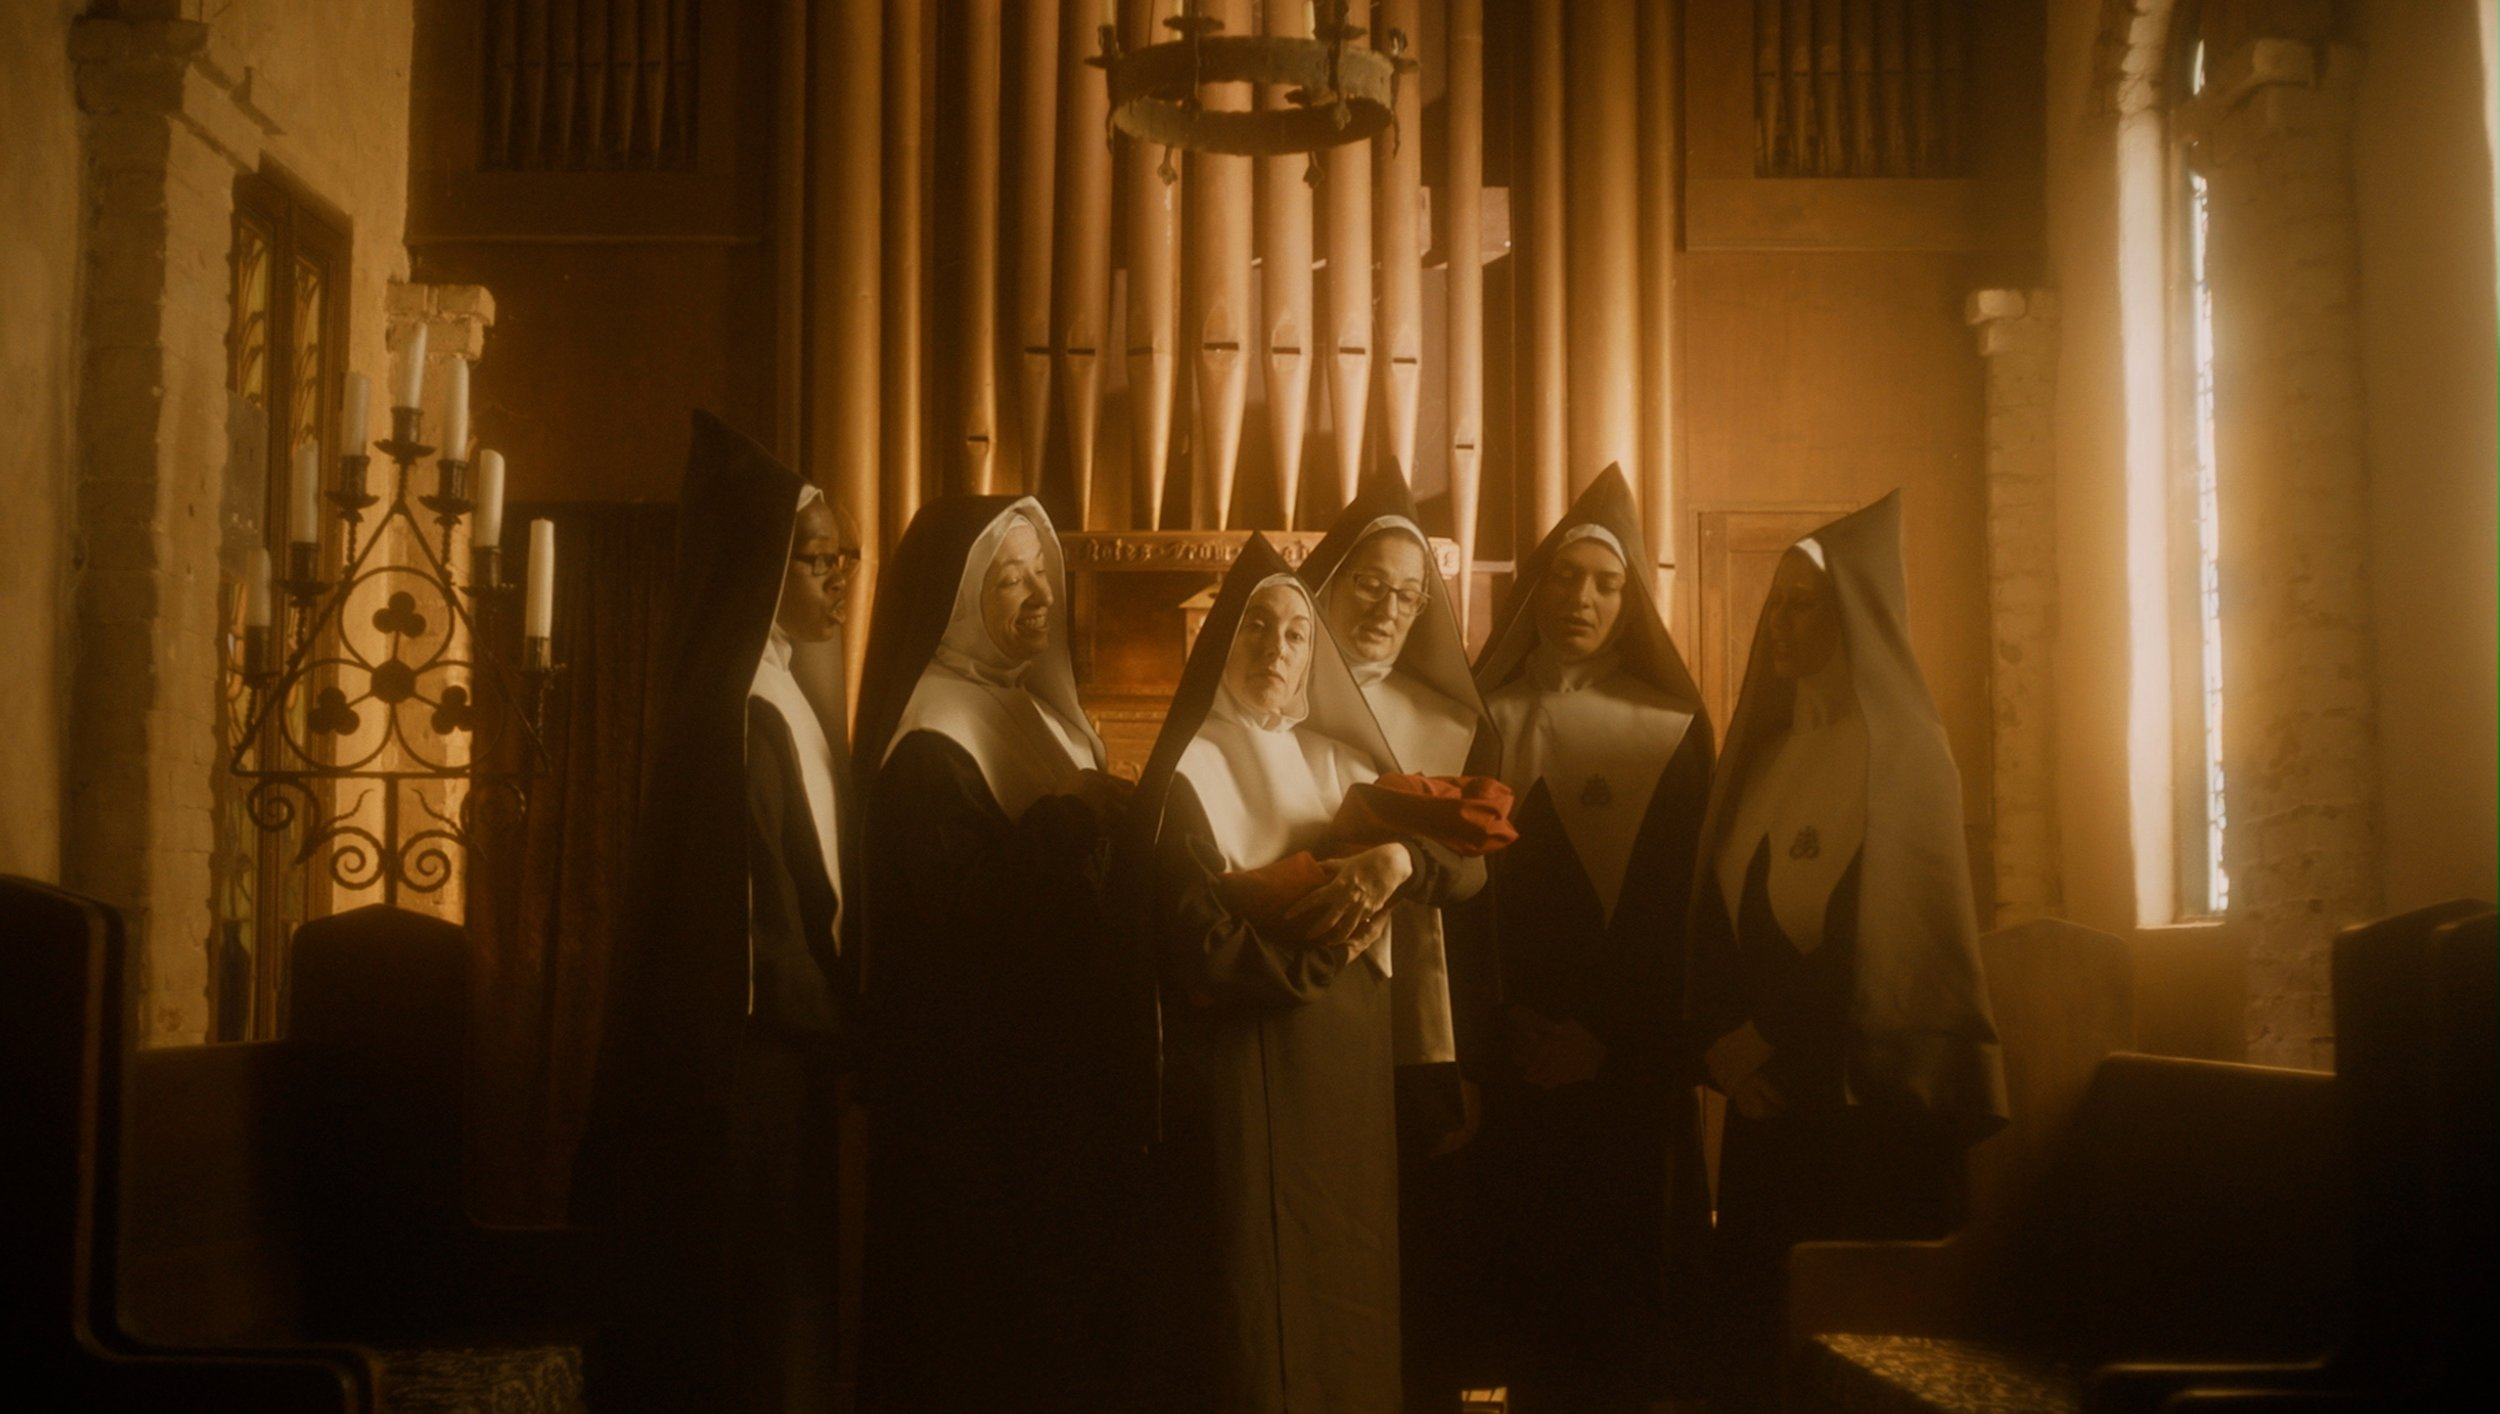 6 Good omens chattering nuns hal kirkland.jpeg